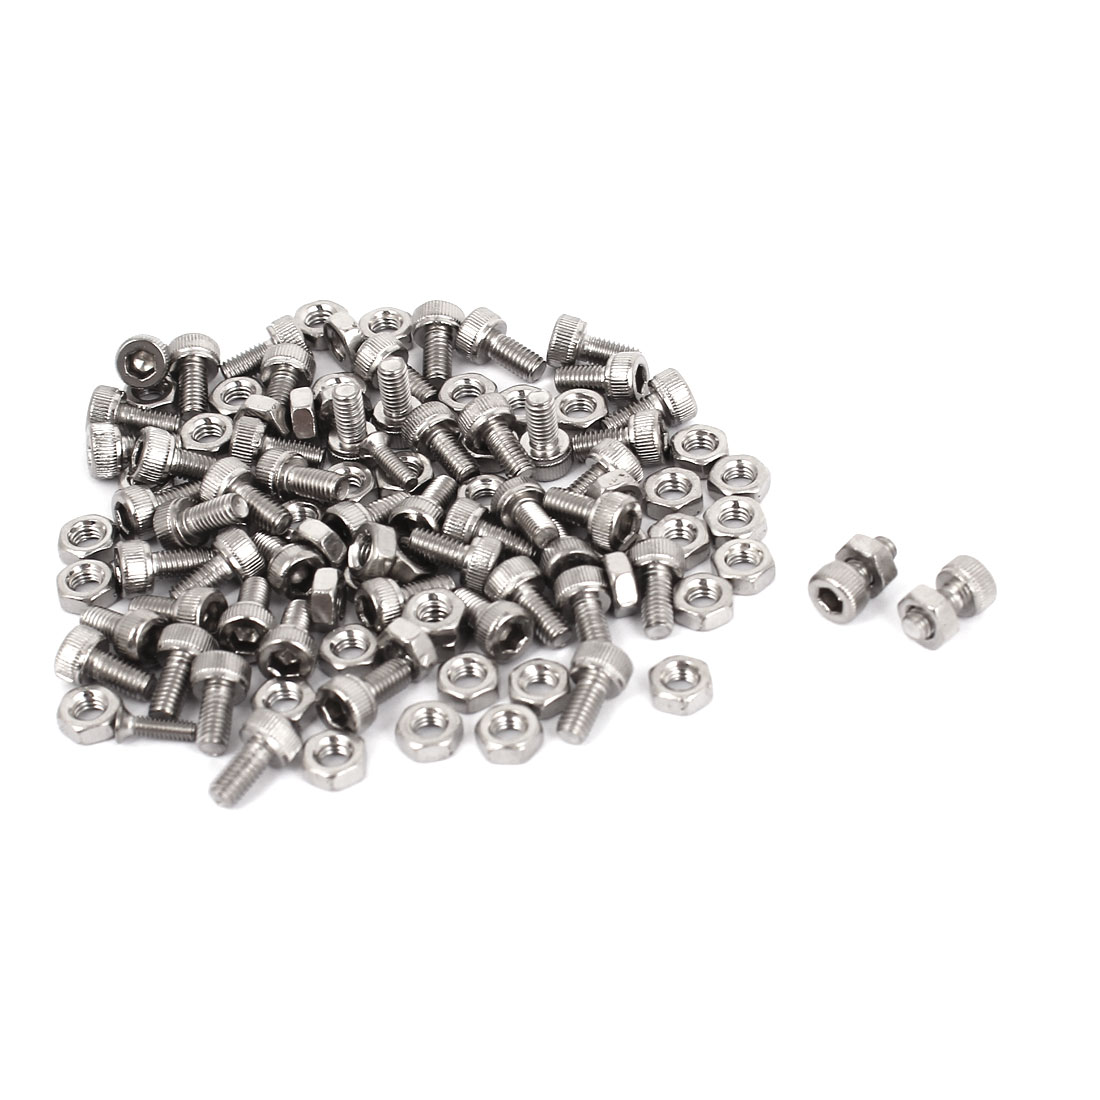 M3x6mm Stainless Steel Hex Socket Head Knurled Cap Screws Bolts Nut Set 50Pcs